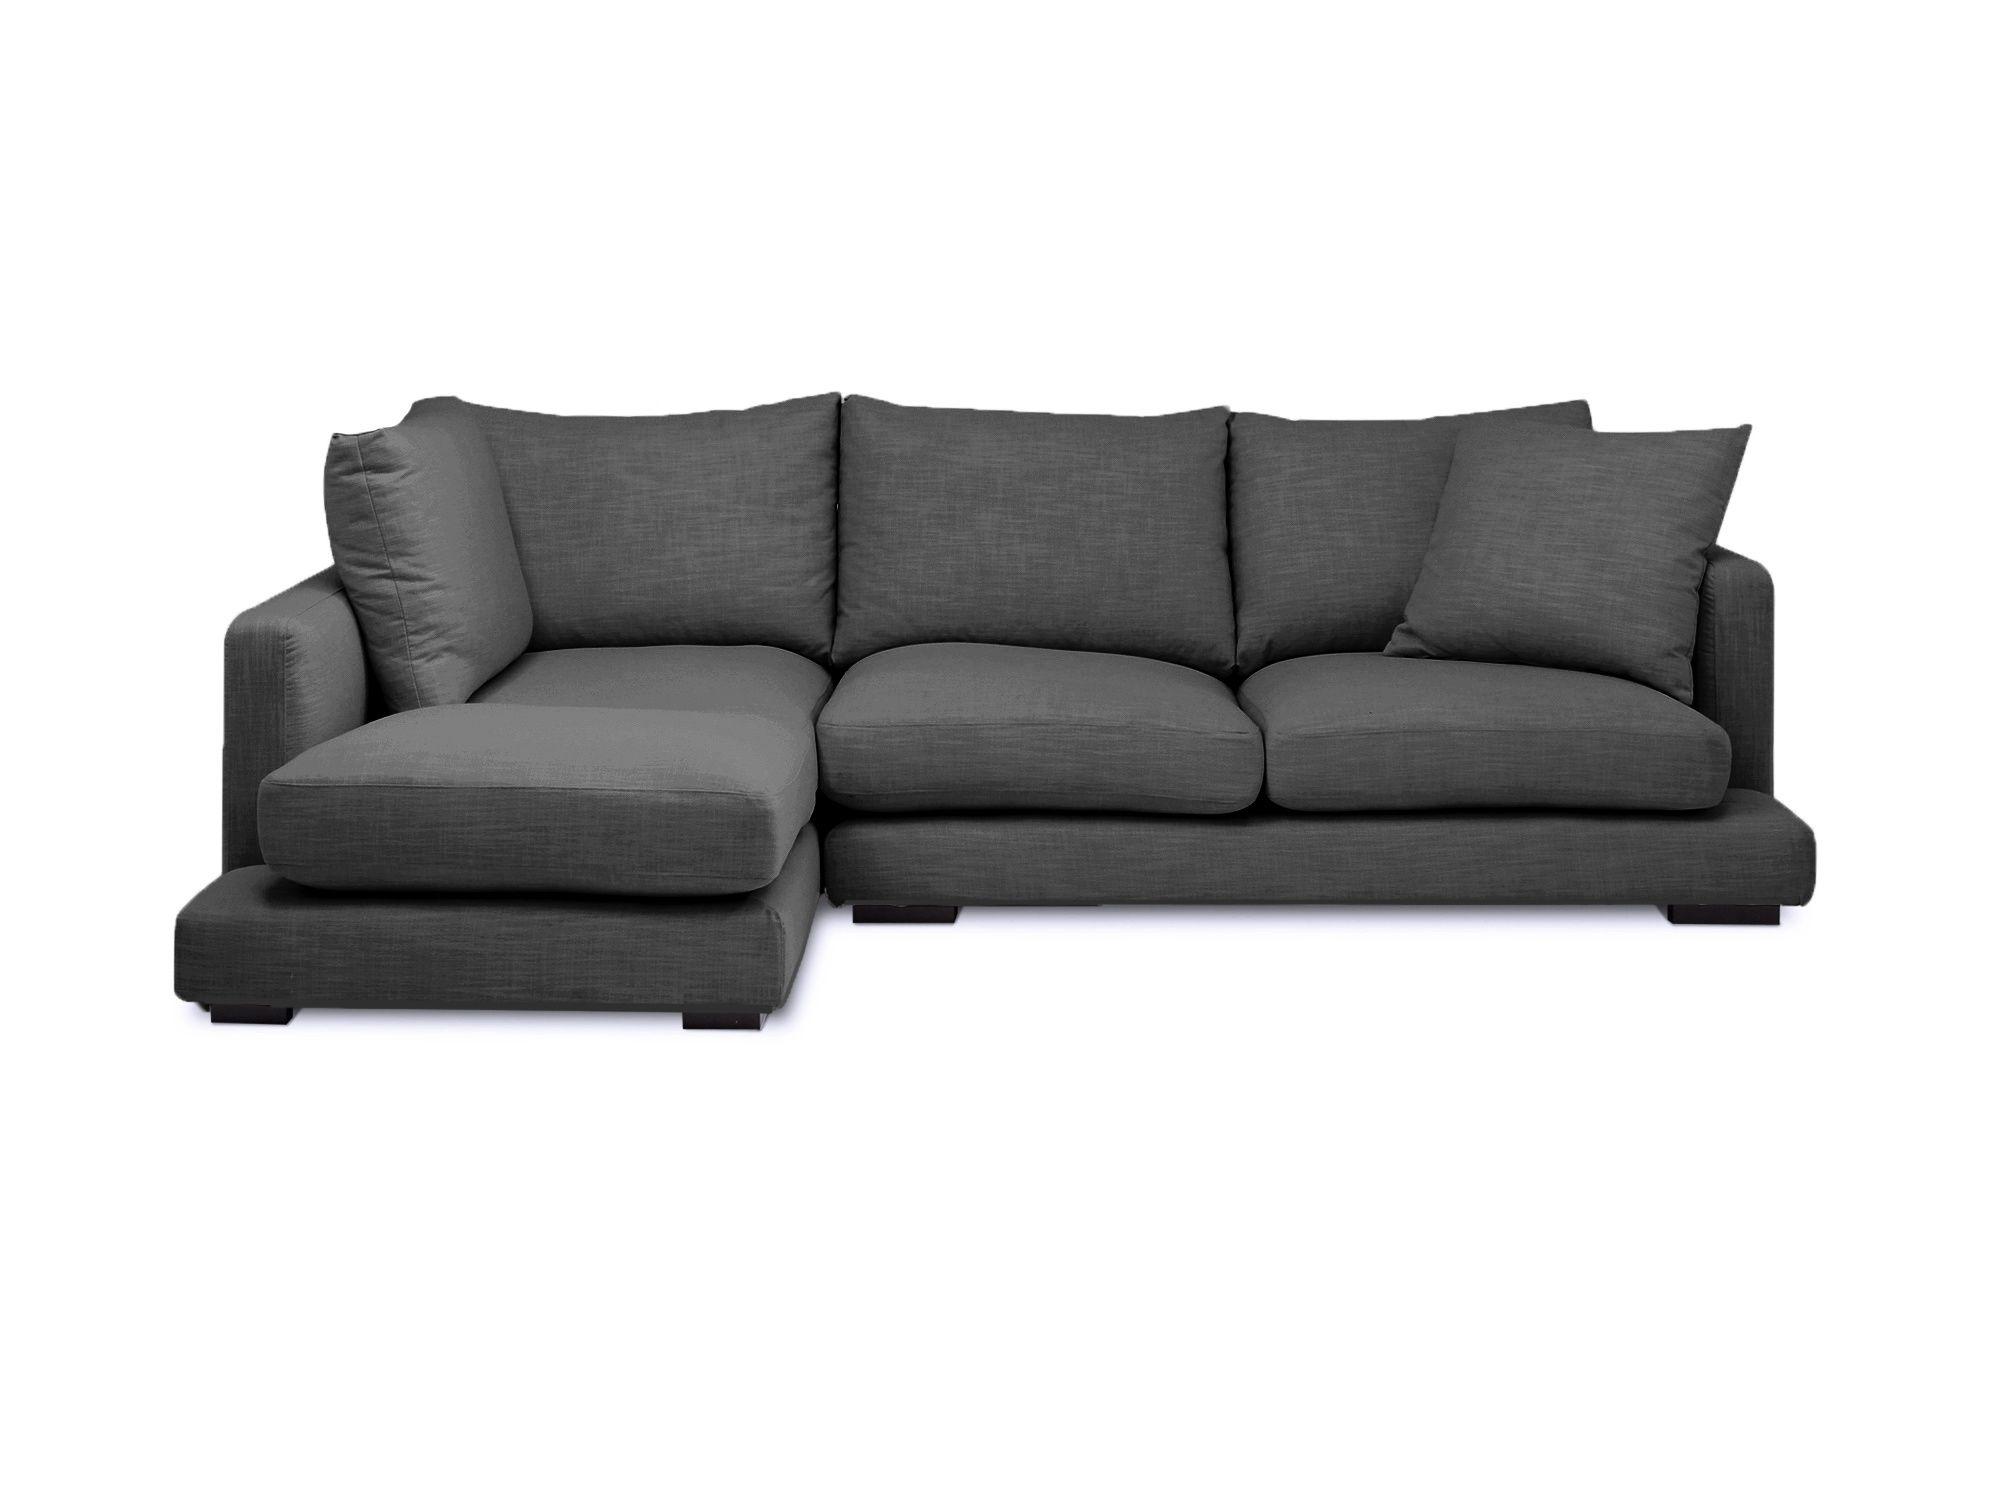 65 Positiv Fotografie Von Mini Couch